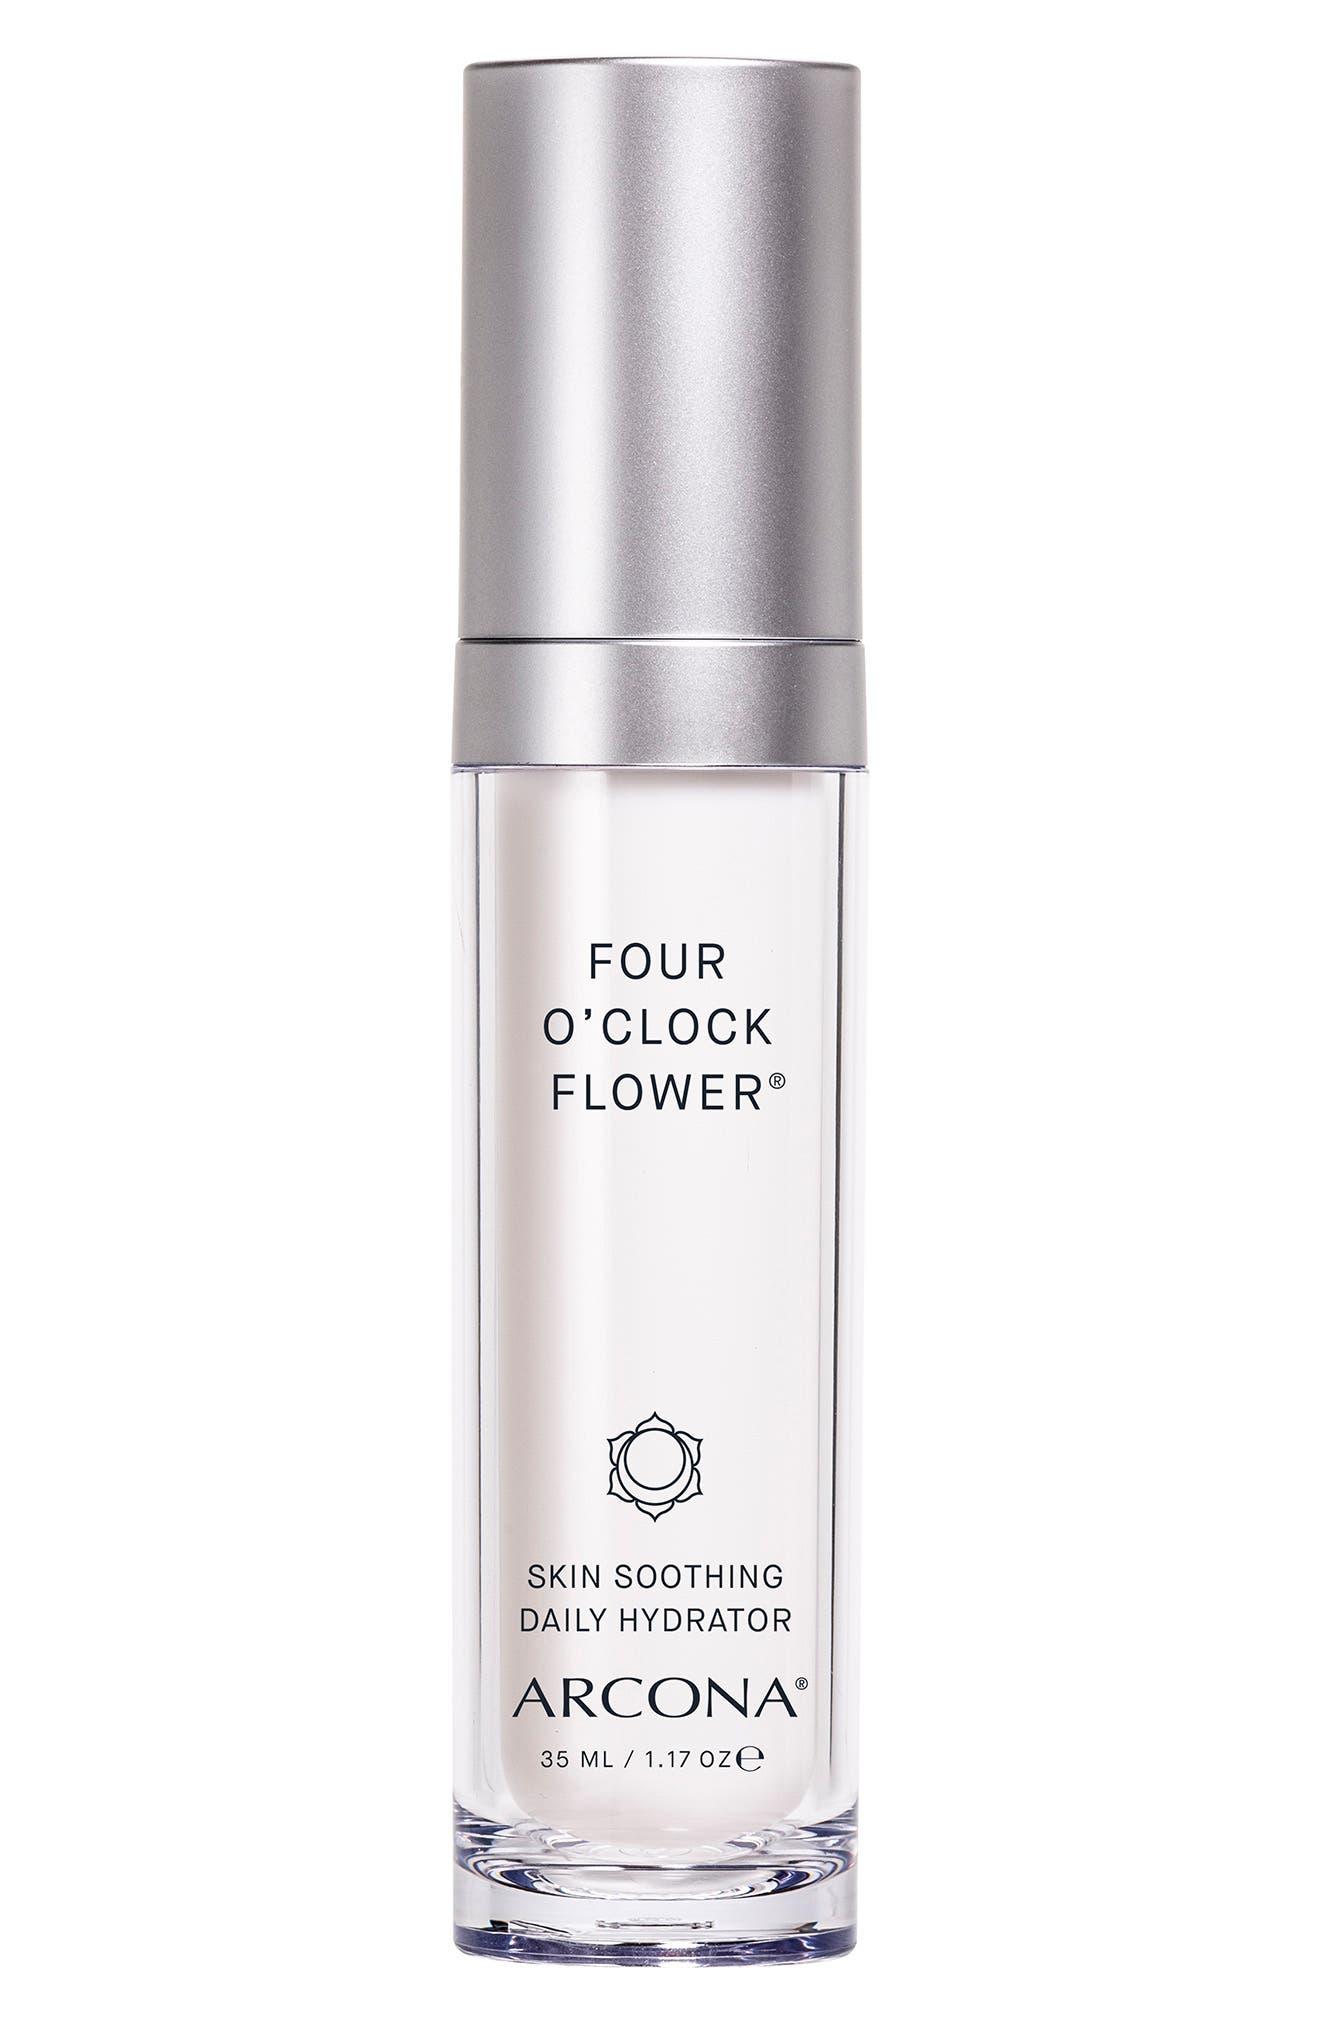 Four O'Clock Flower Hydrator Face Moisturizer For Sensitive Skin